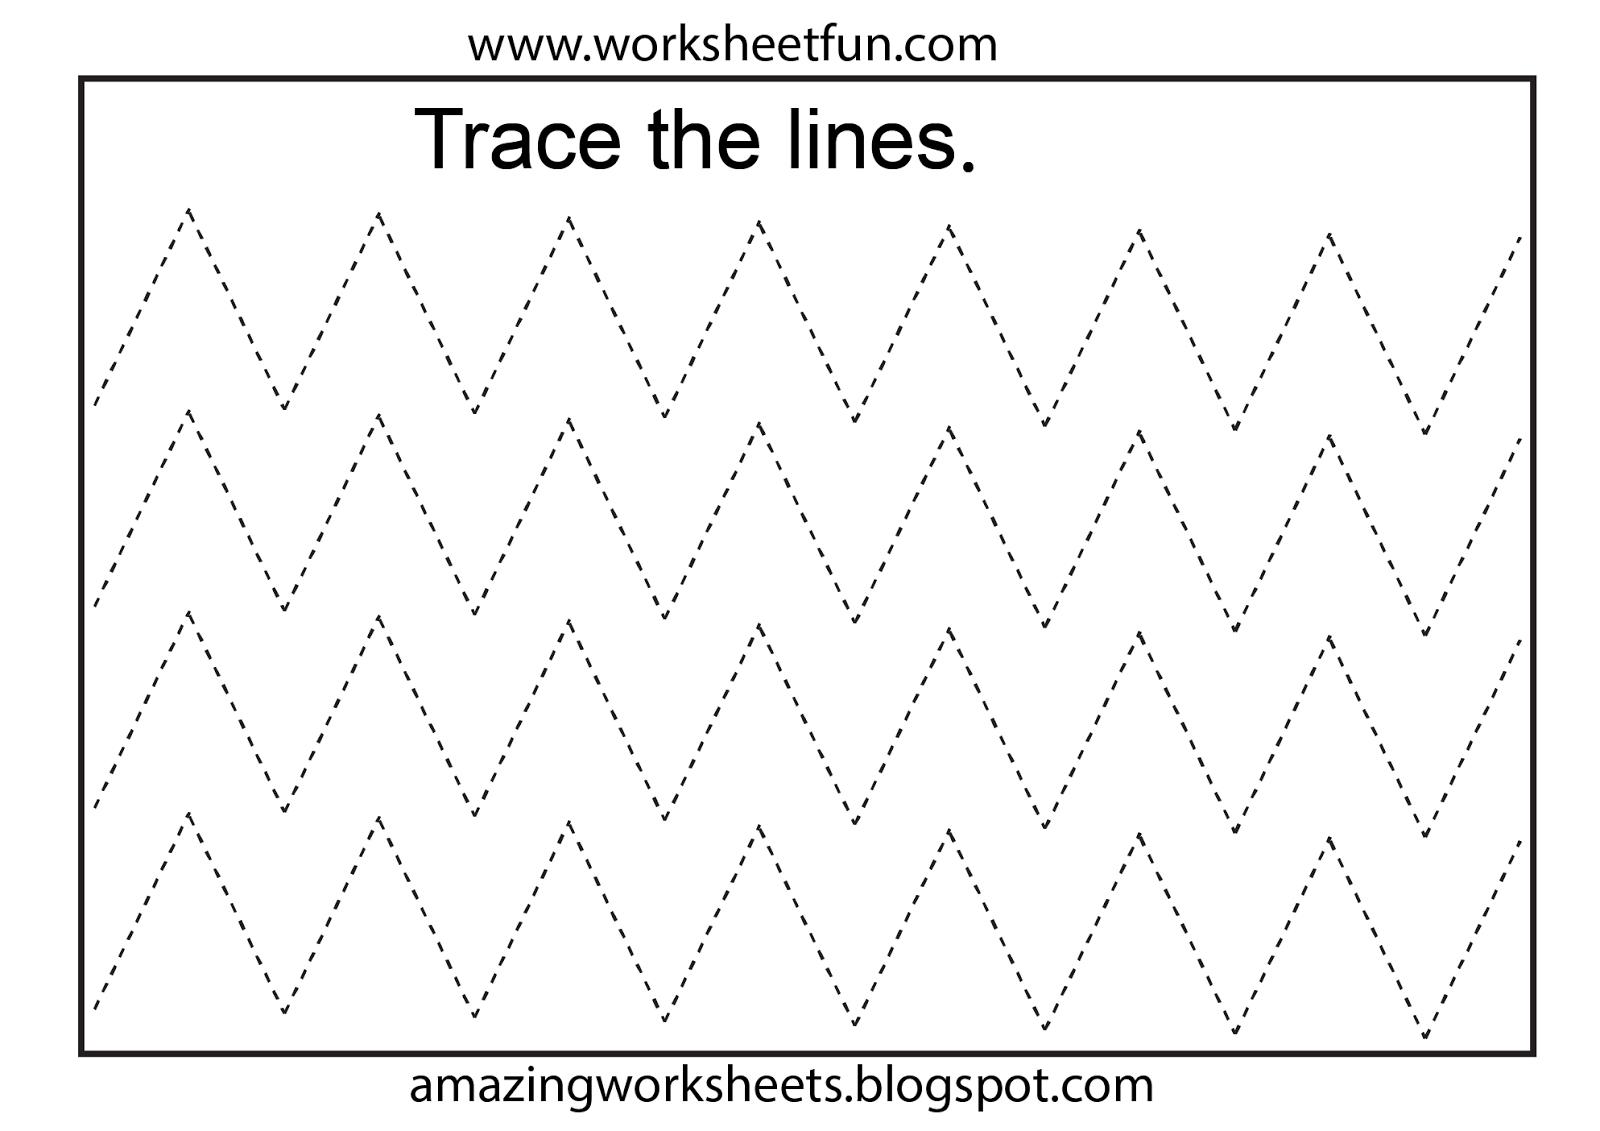 Worksheetfun - Free Printable Worksheets | Toddler Worksheets - Free | Free Printable Preschool Worksheets Tracing Lines